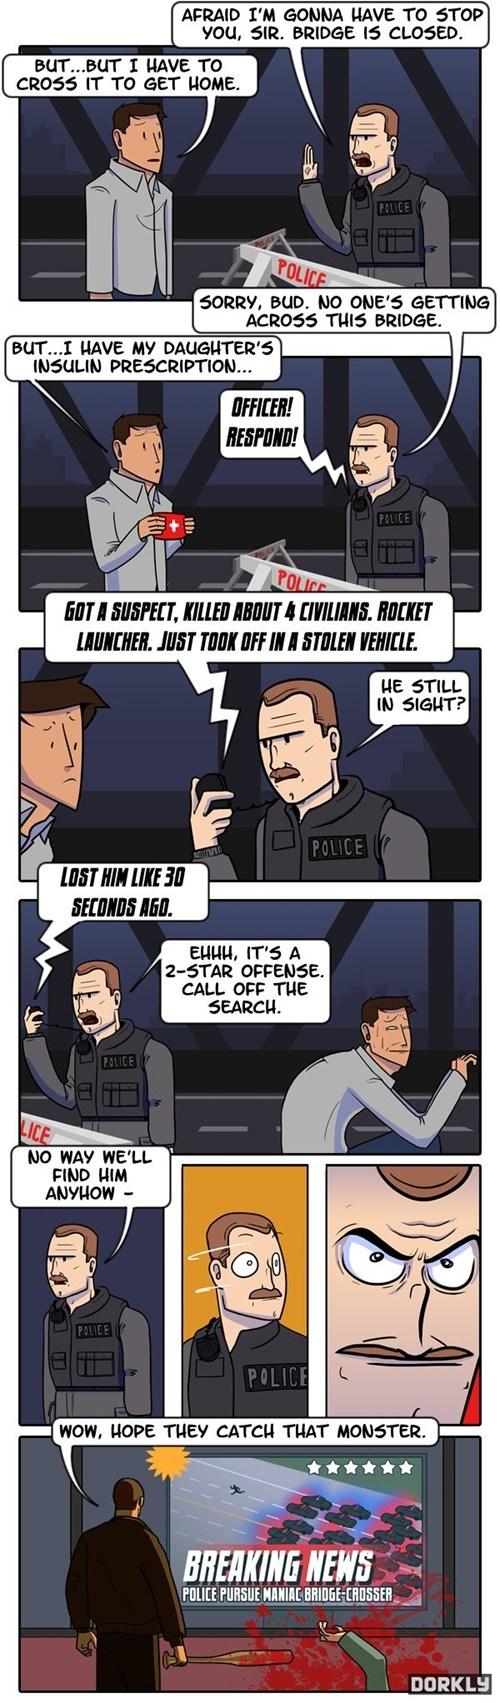 dorkly comics Grand Theft Auto liberty city - 7340573696